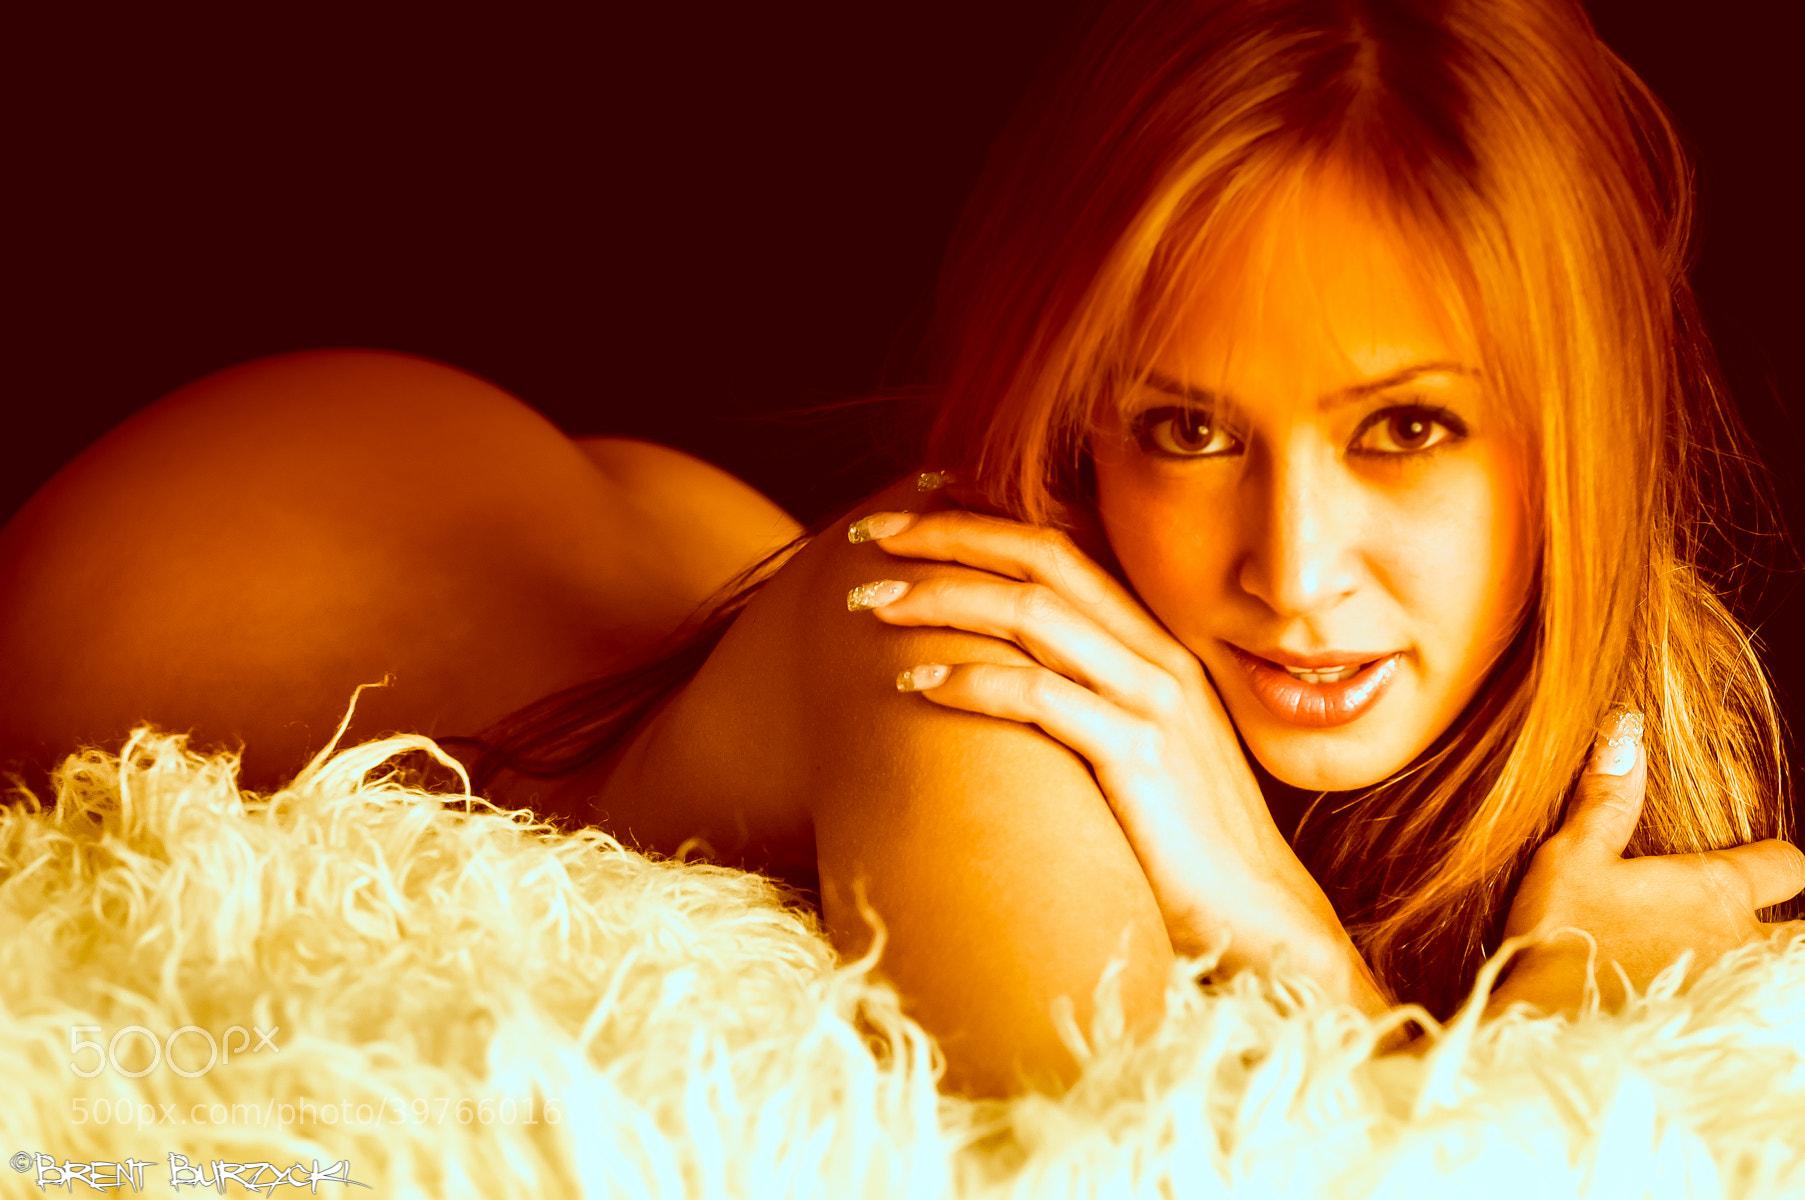 Photograph Firelight...... by Brent Burzycki on 500px